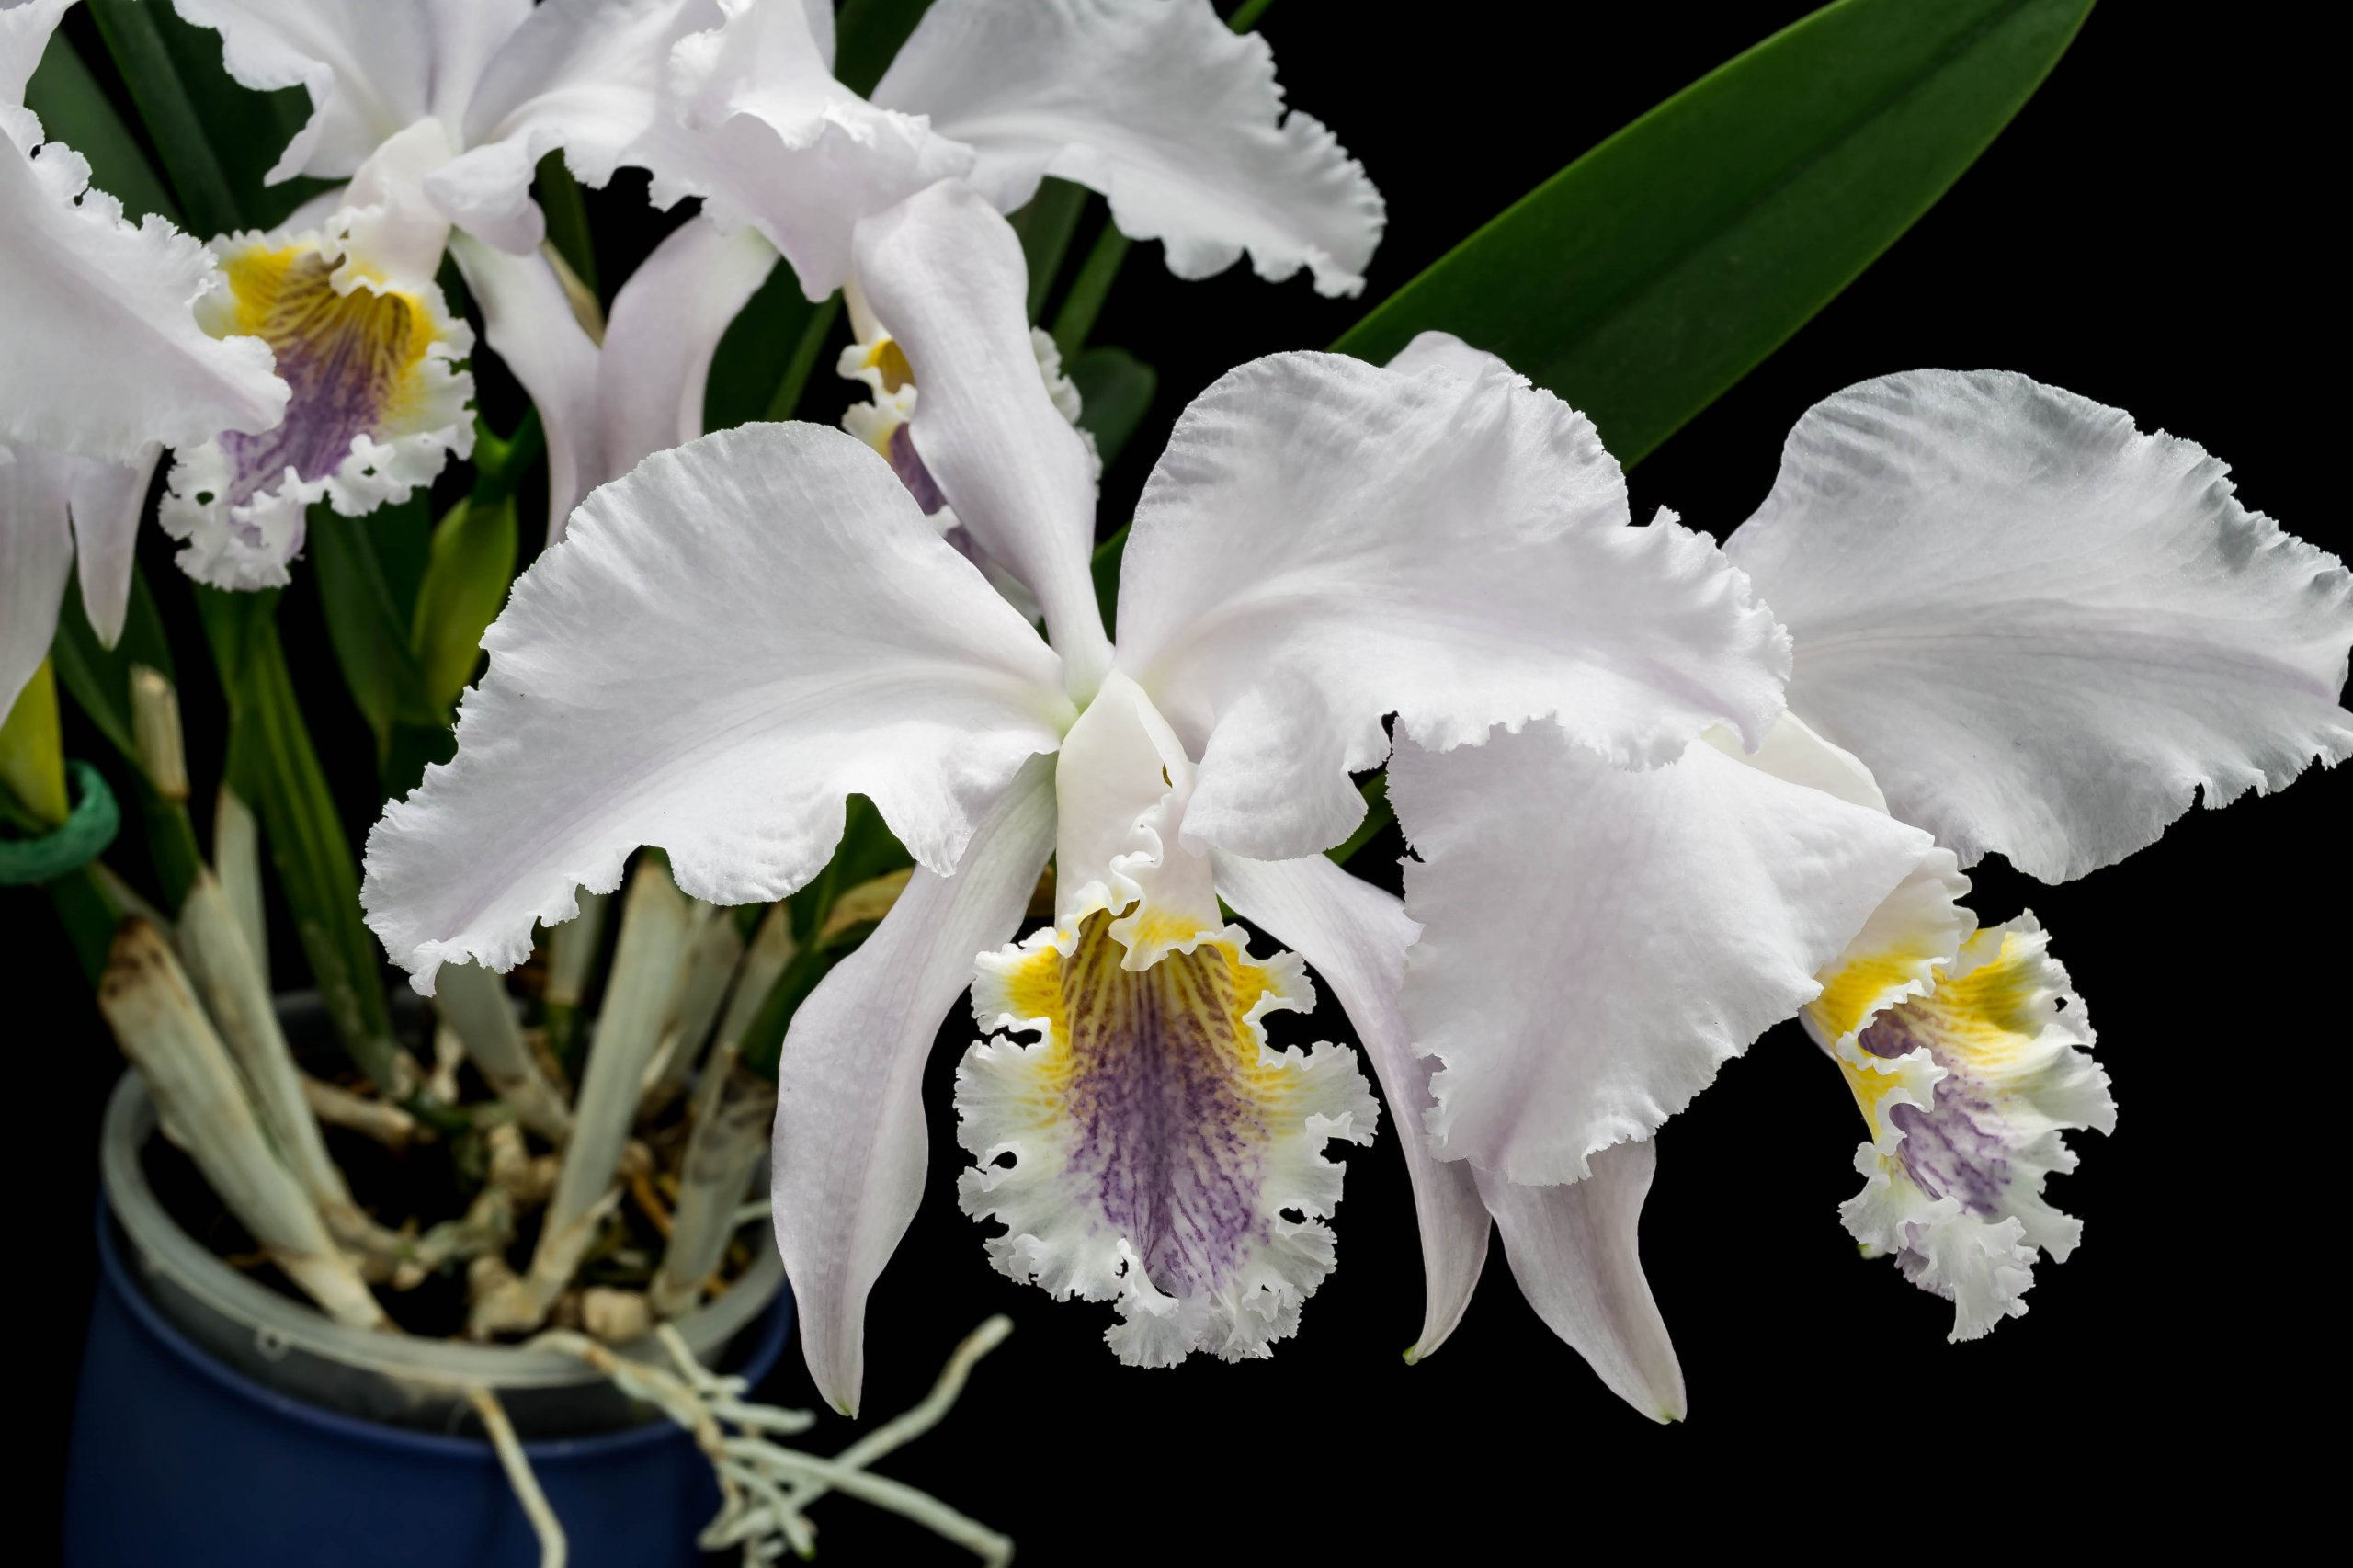 16052021 Cattleya mossiae var. coerulea 2 (4).jpg